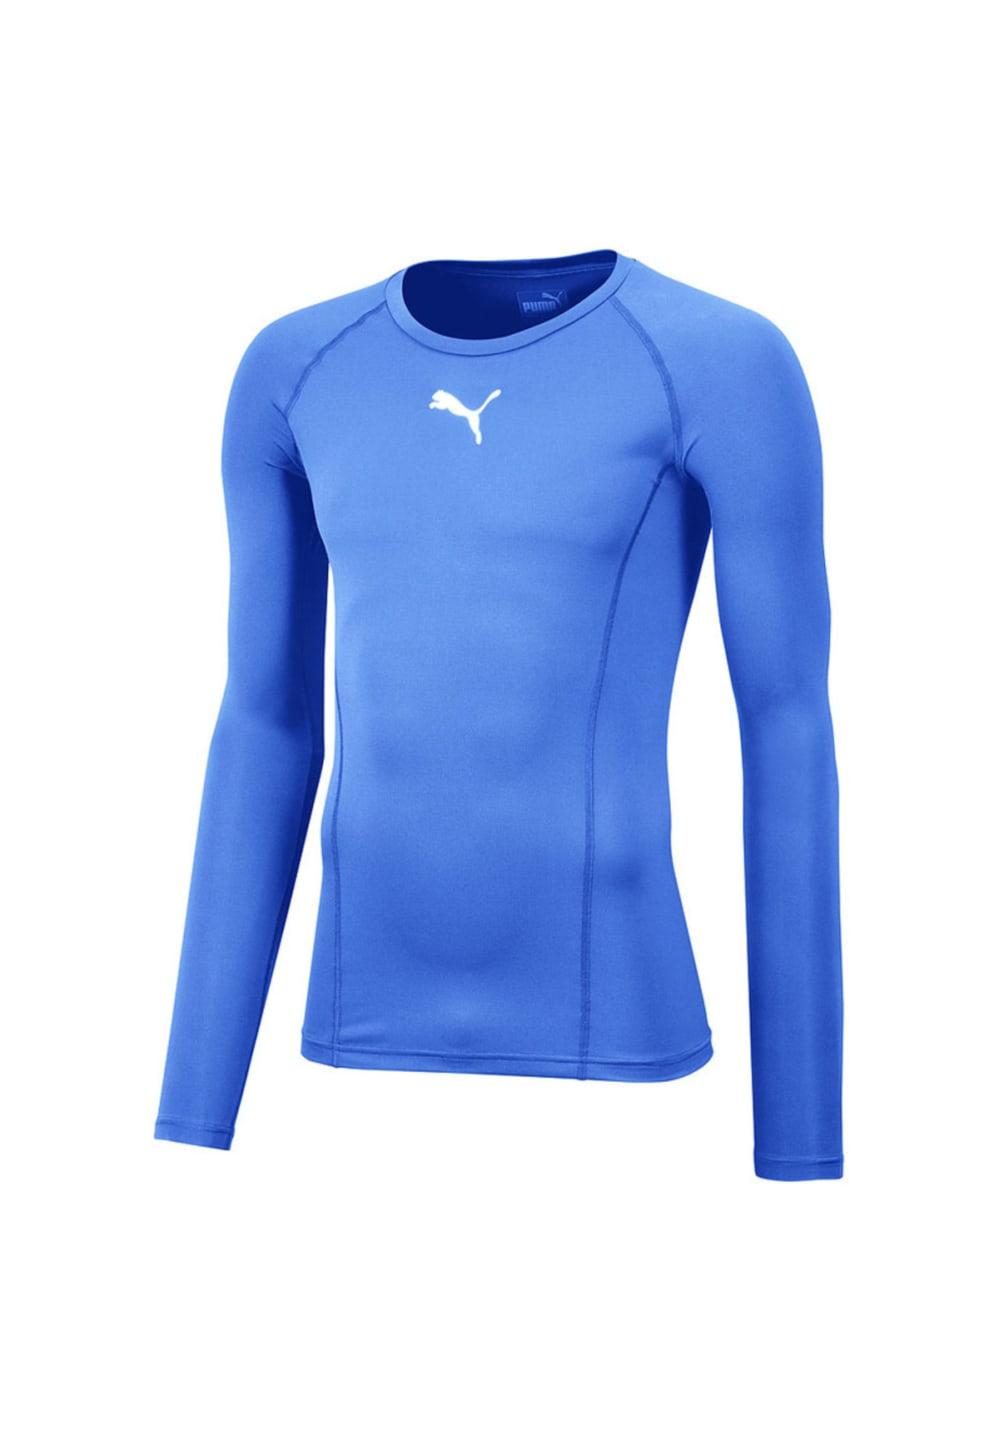 3b29b5abcfd Puma Liga Baselayer Tee Long Sleeve - Running tops for Men - Blue ...